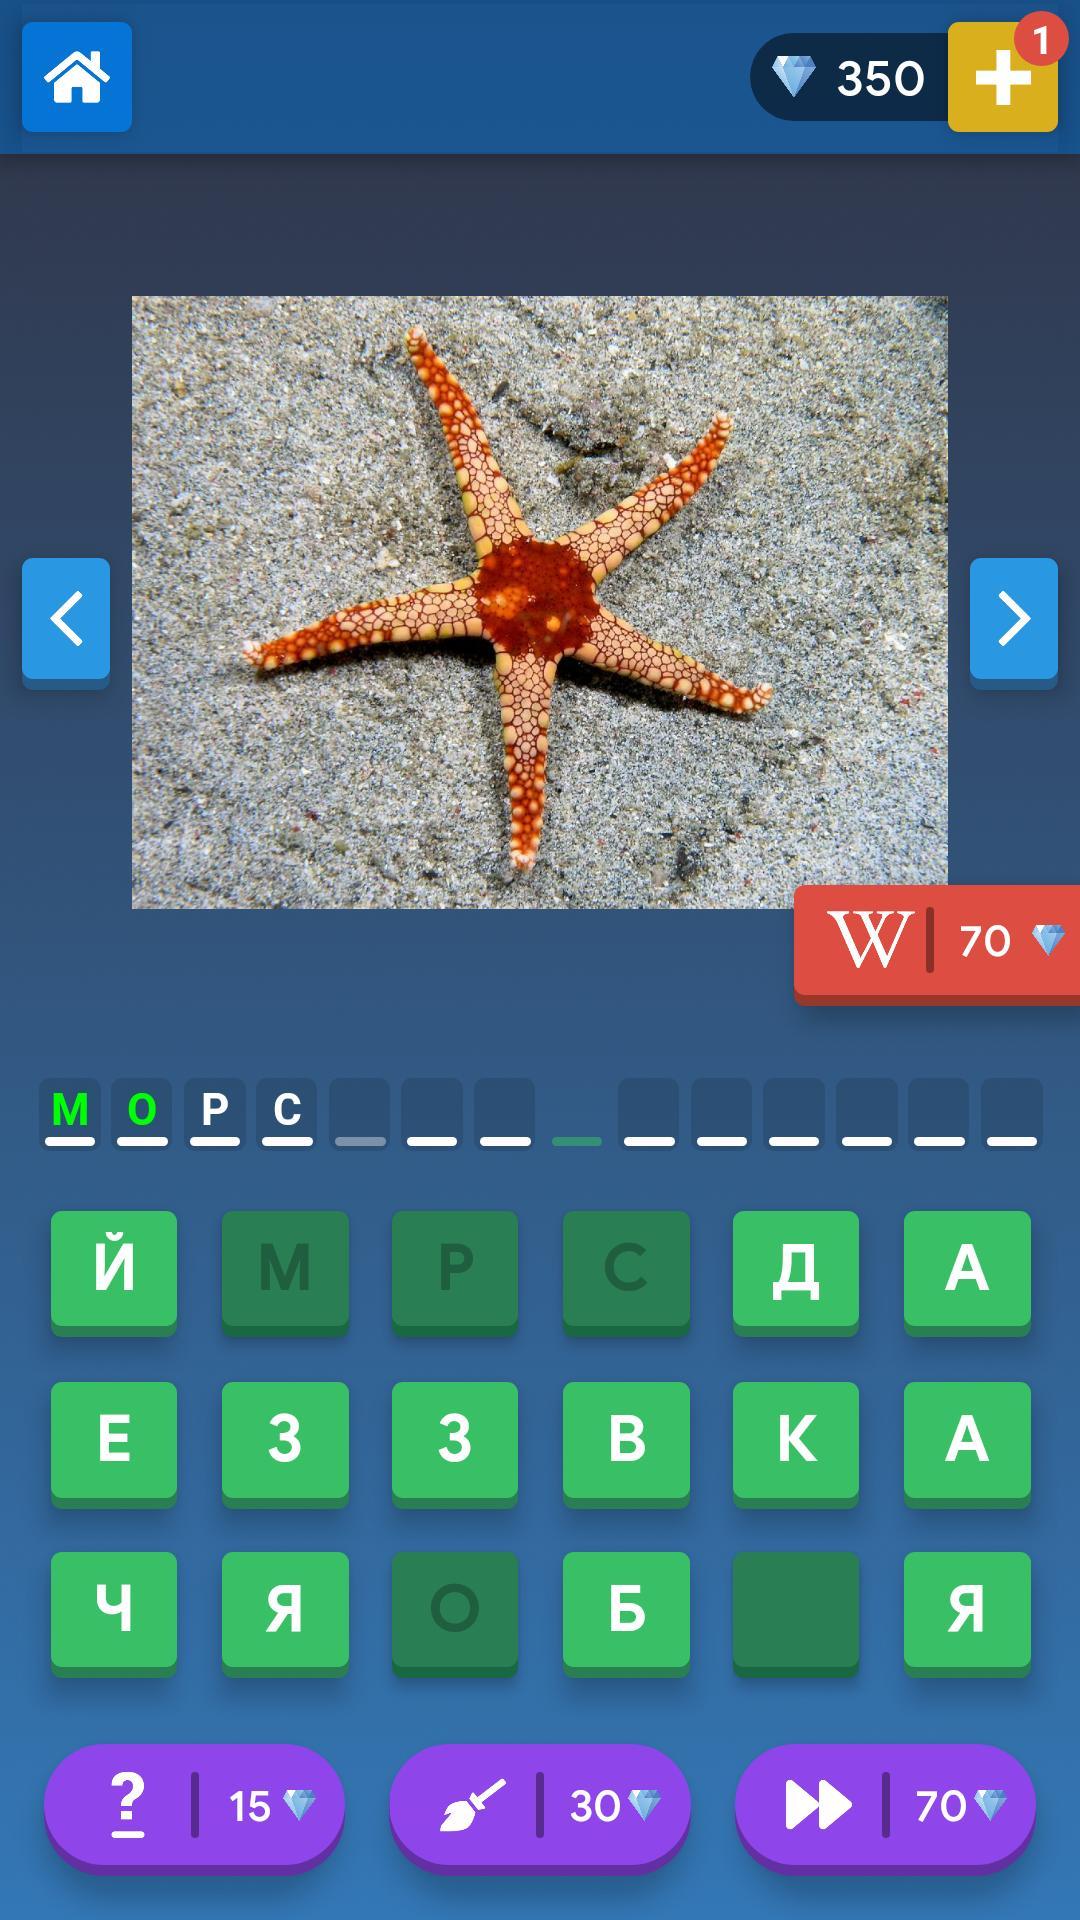 Игра угадай животное по картинке онлайн